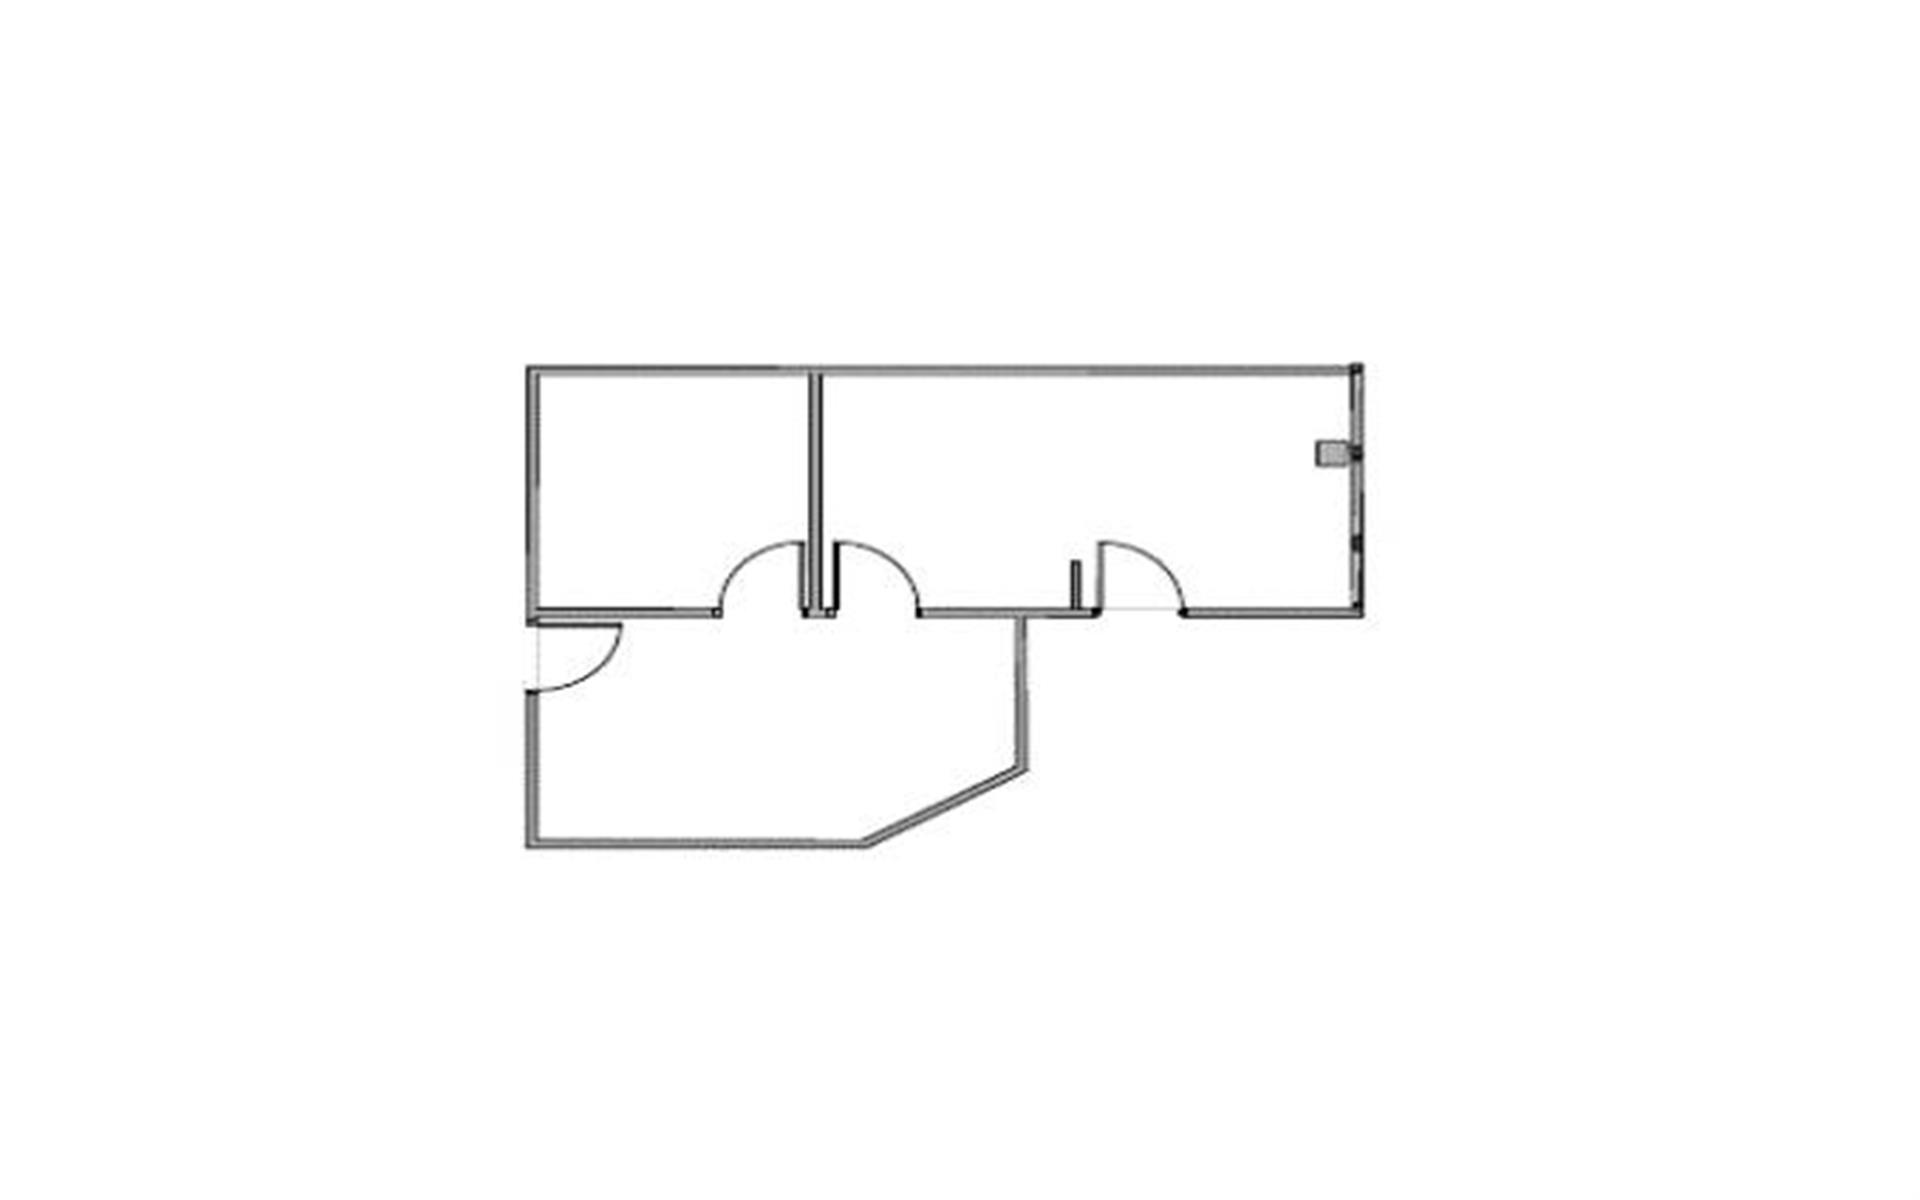 Boxer - 5005 Royal Lane - Team Space | Suite 141